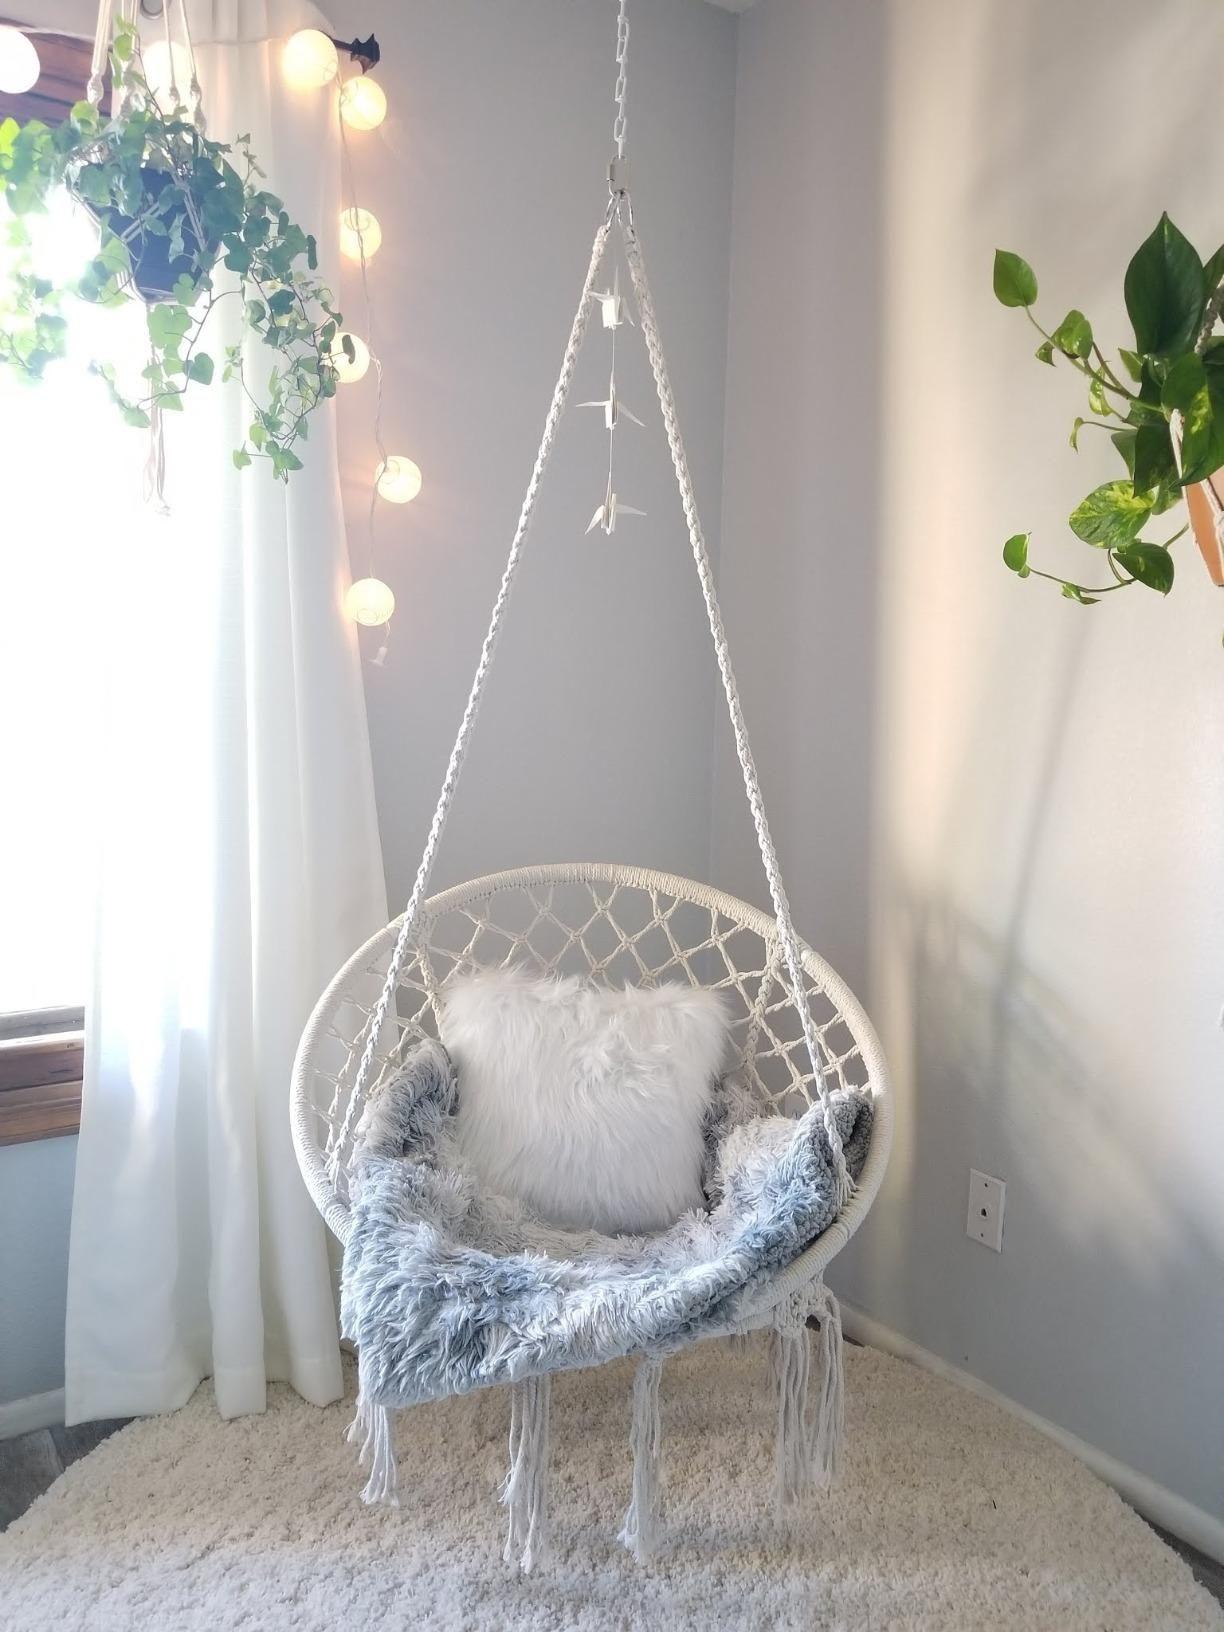 Amazon Com Sorbus Hammock Chair Macrame Swing 265 Pound Capacity Perfect For Indoor Outdoor Home Patio Deck Yard Gard Bedroom Decor Cozy Room Room Decor